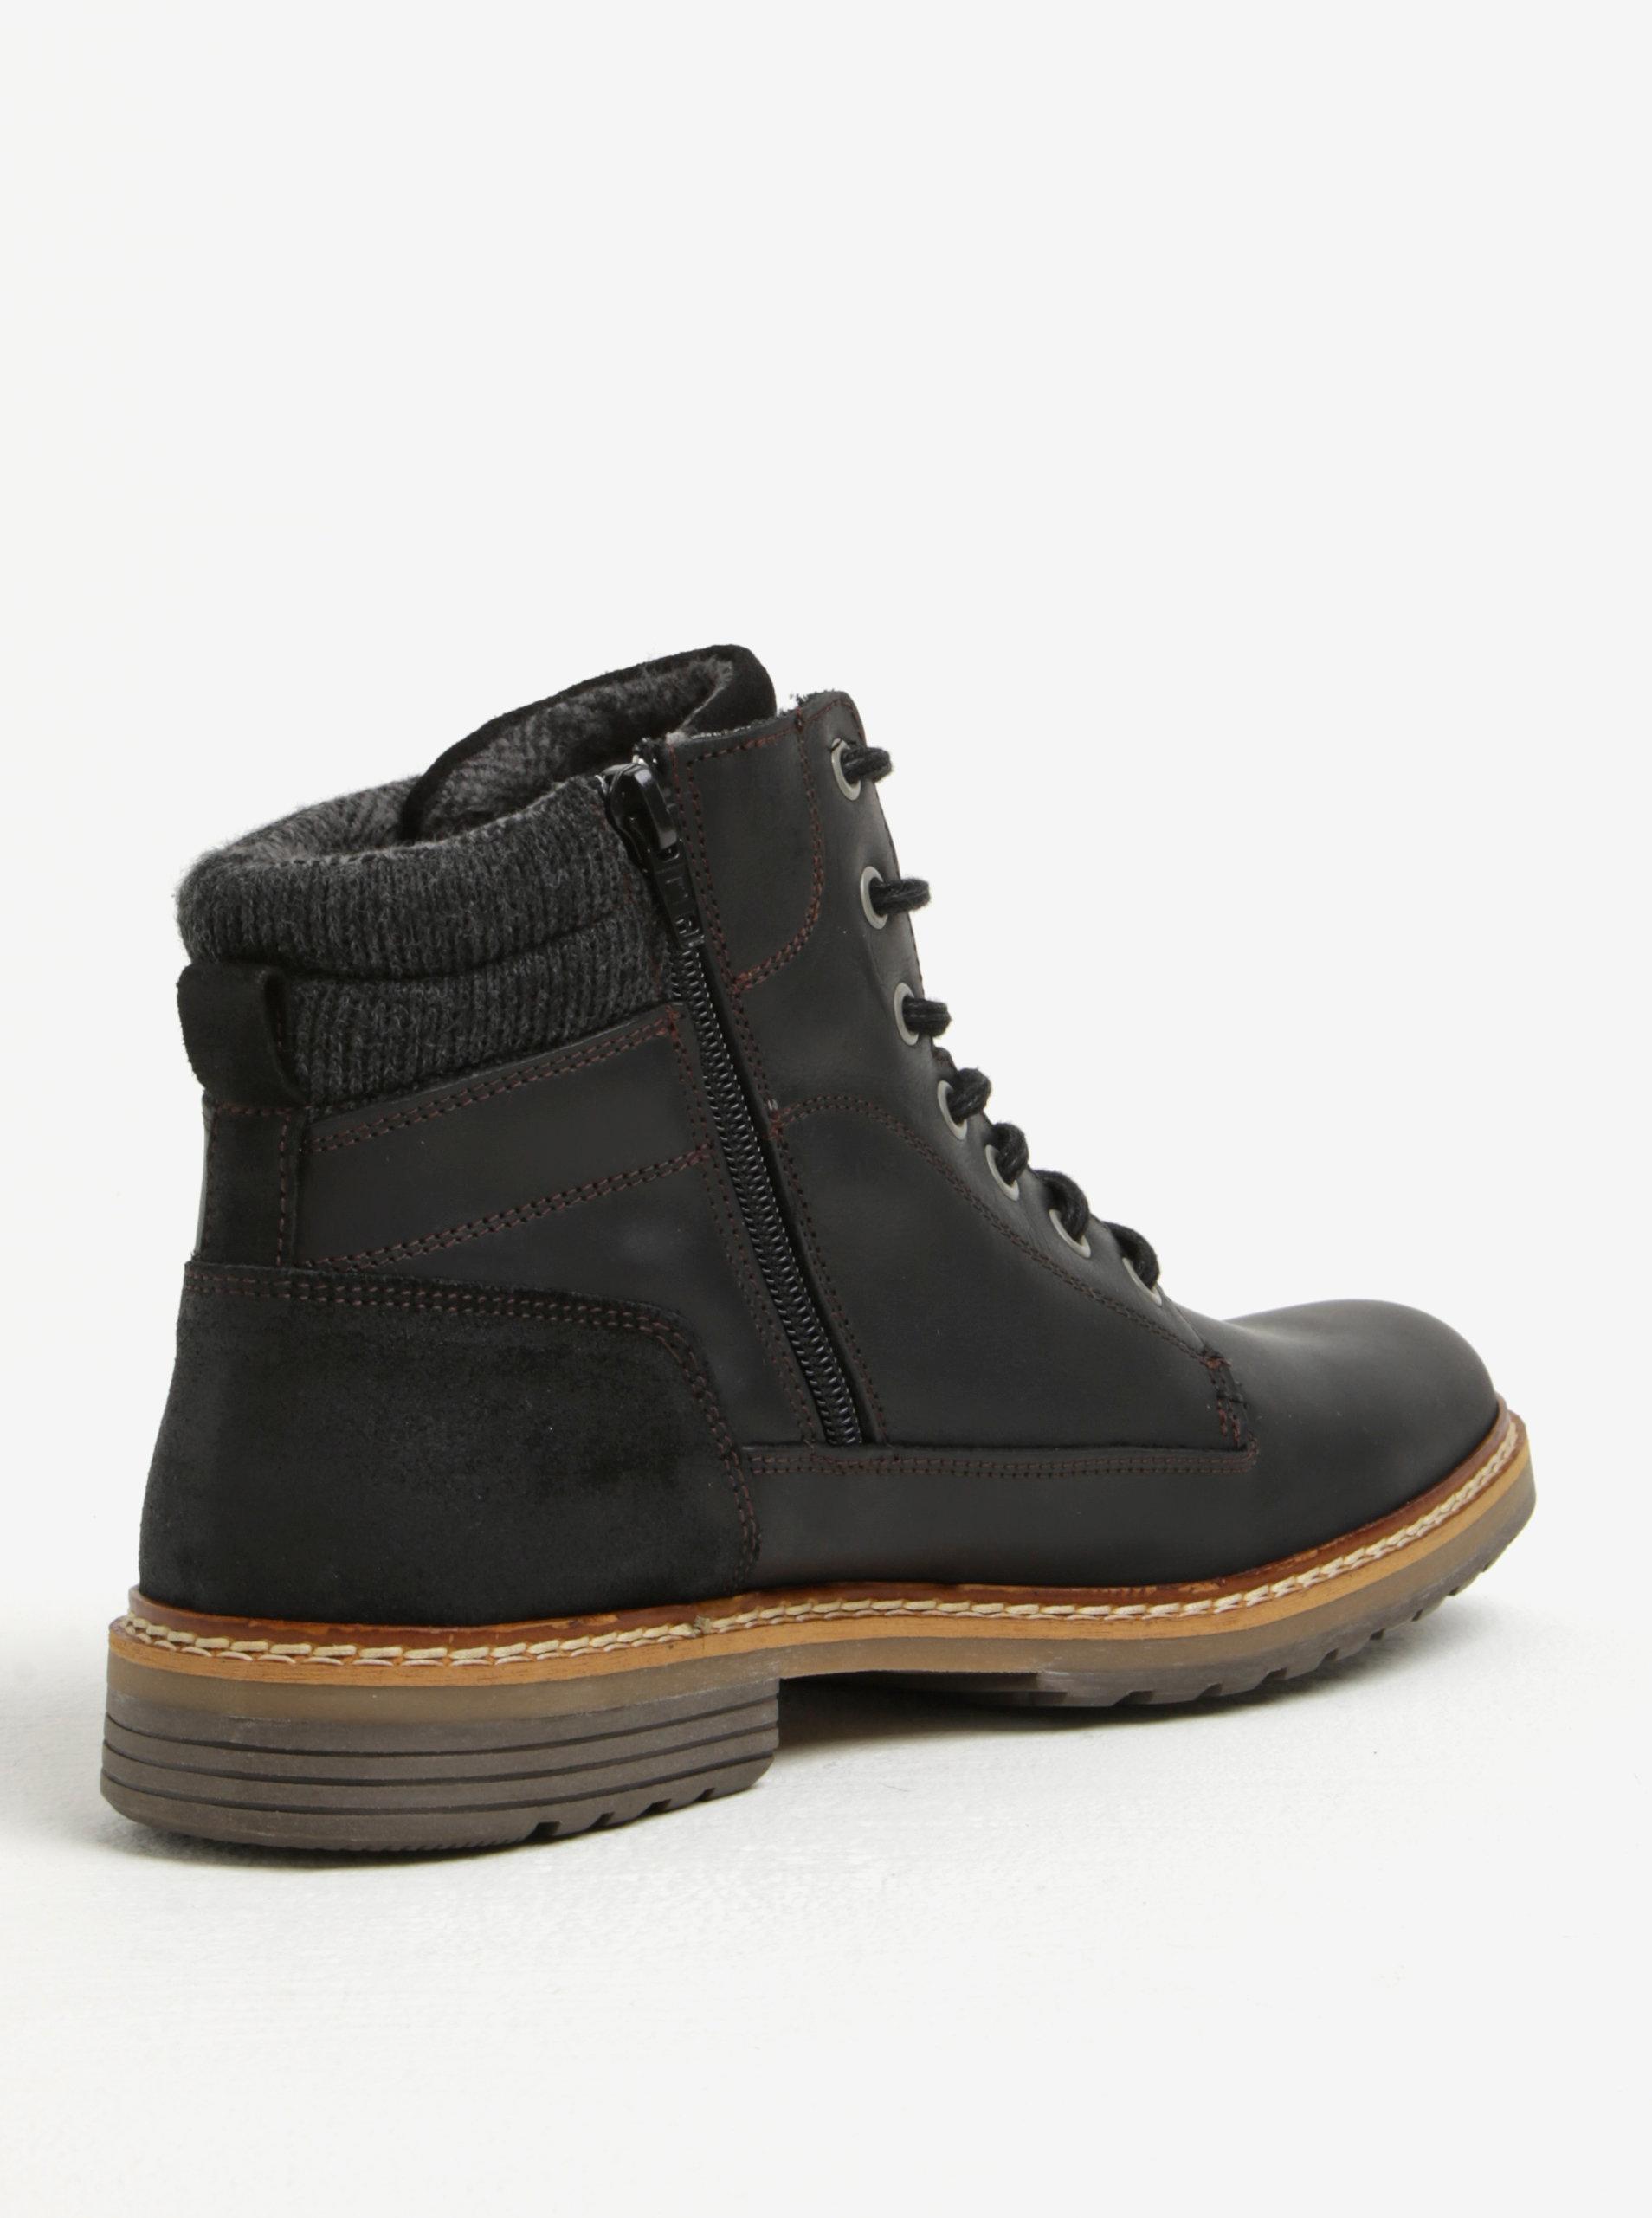 Čierne pánske kožené členkové zimné topánky na zips Bullboxer ... bc2750cffe0